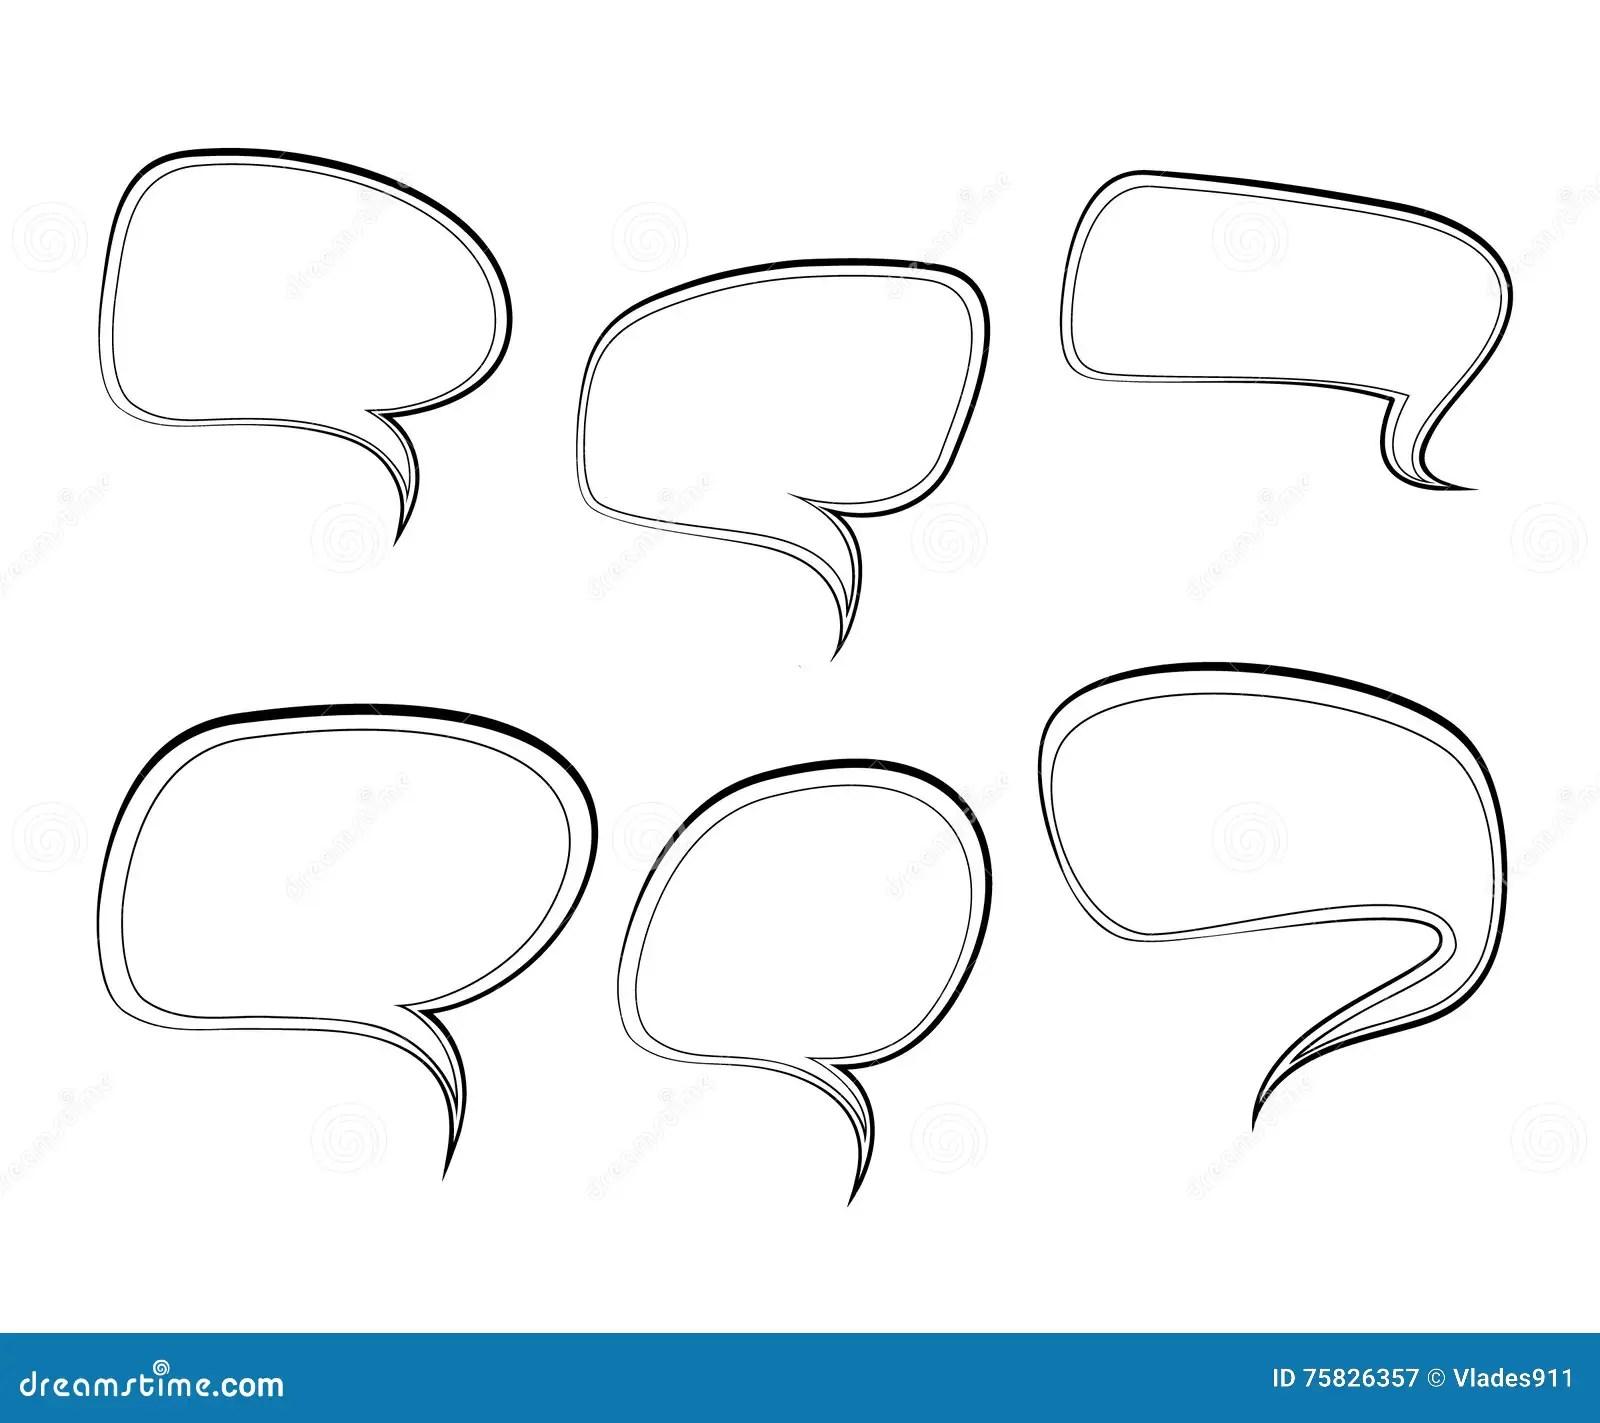 Speech Bubble On Phone Icon, Outline Style Cartoon Vector